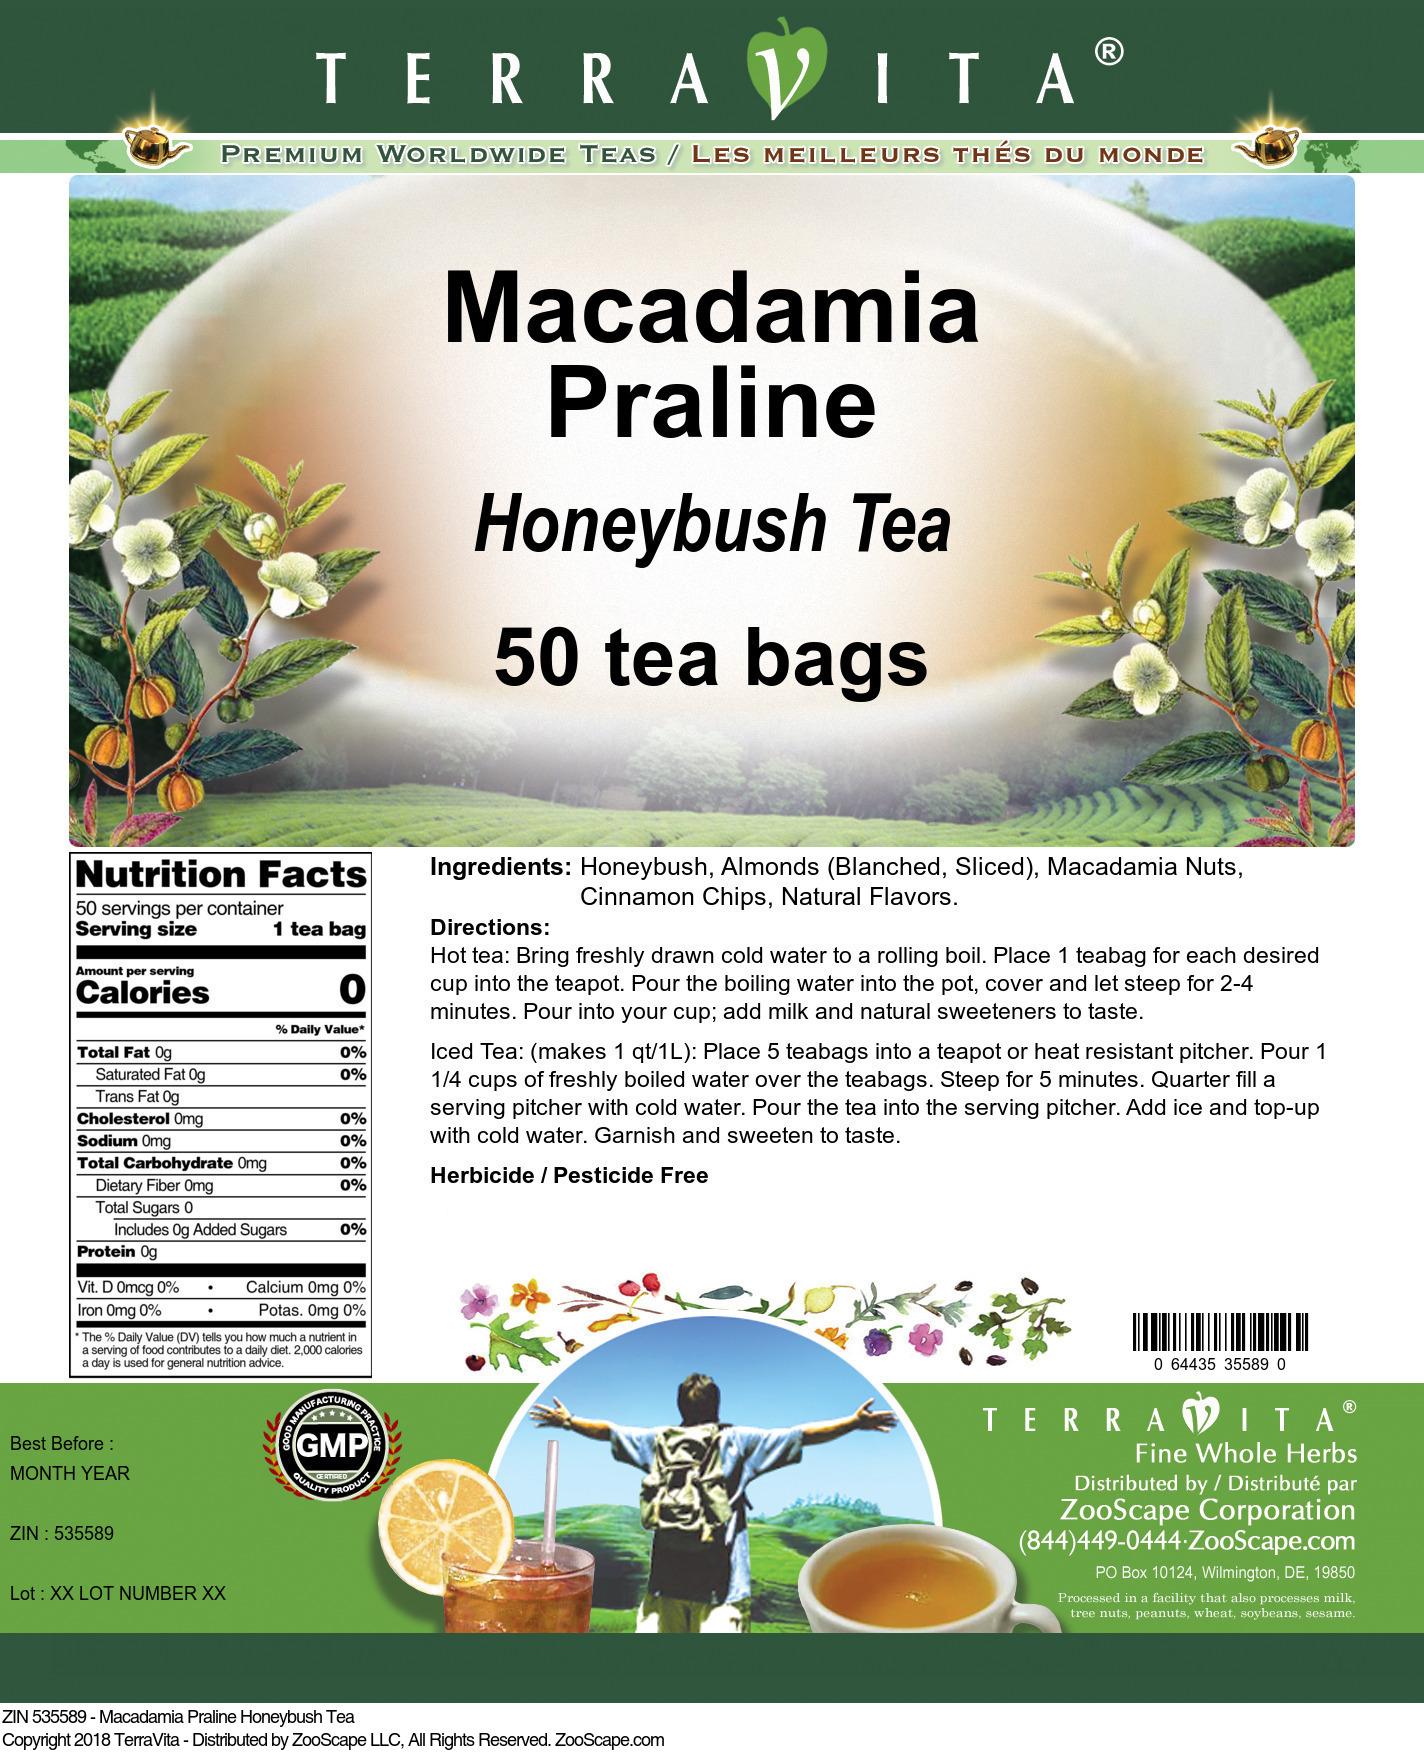 Macadamia Praline Honeybush Tea